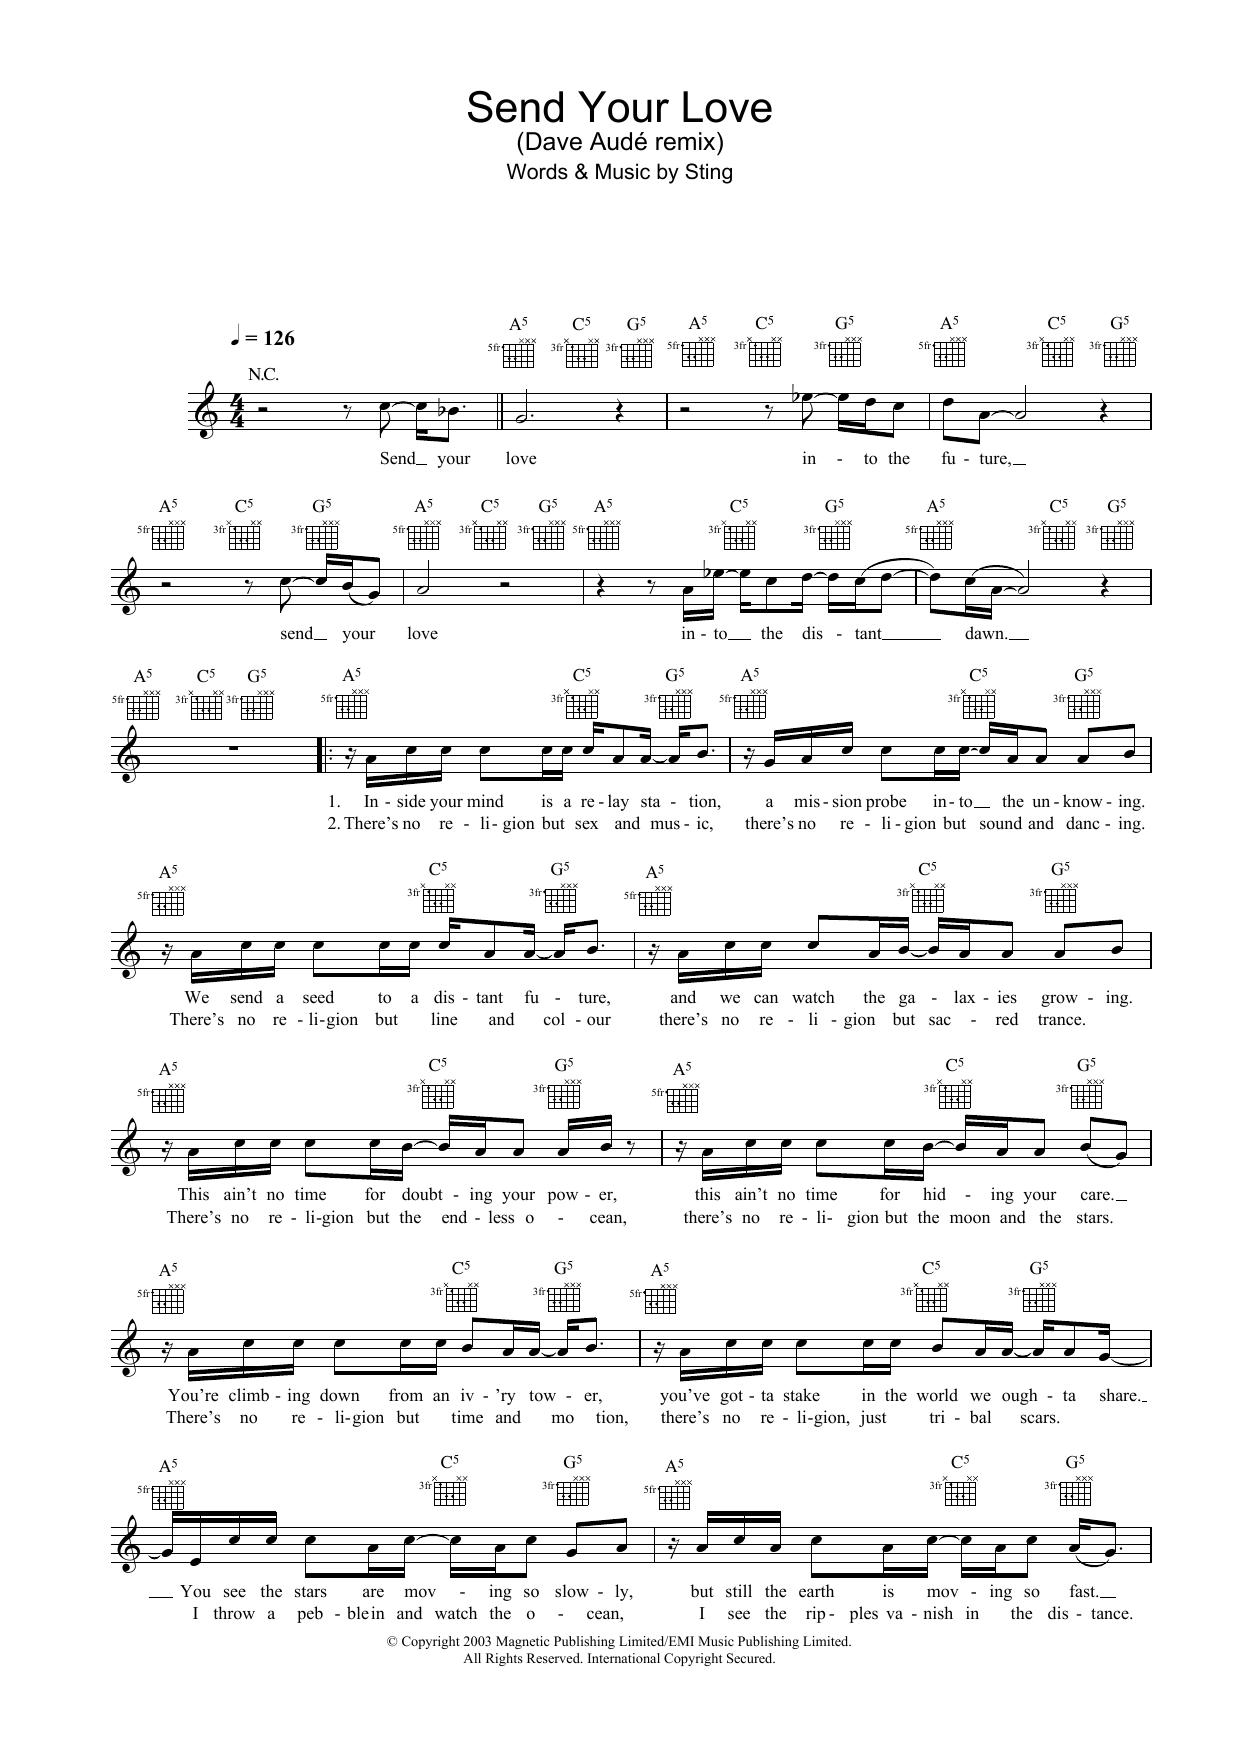 Sting - Send Your Love (Dave Aude remix)